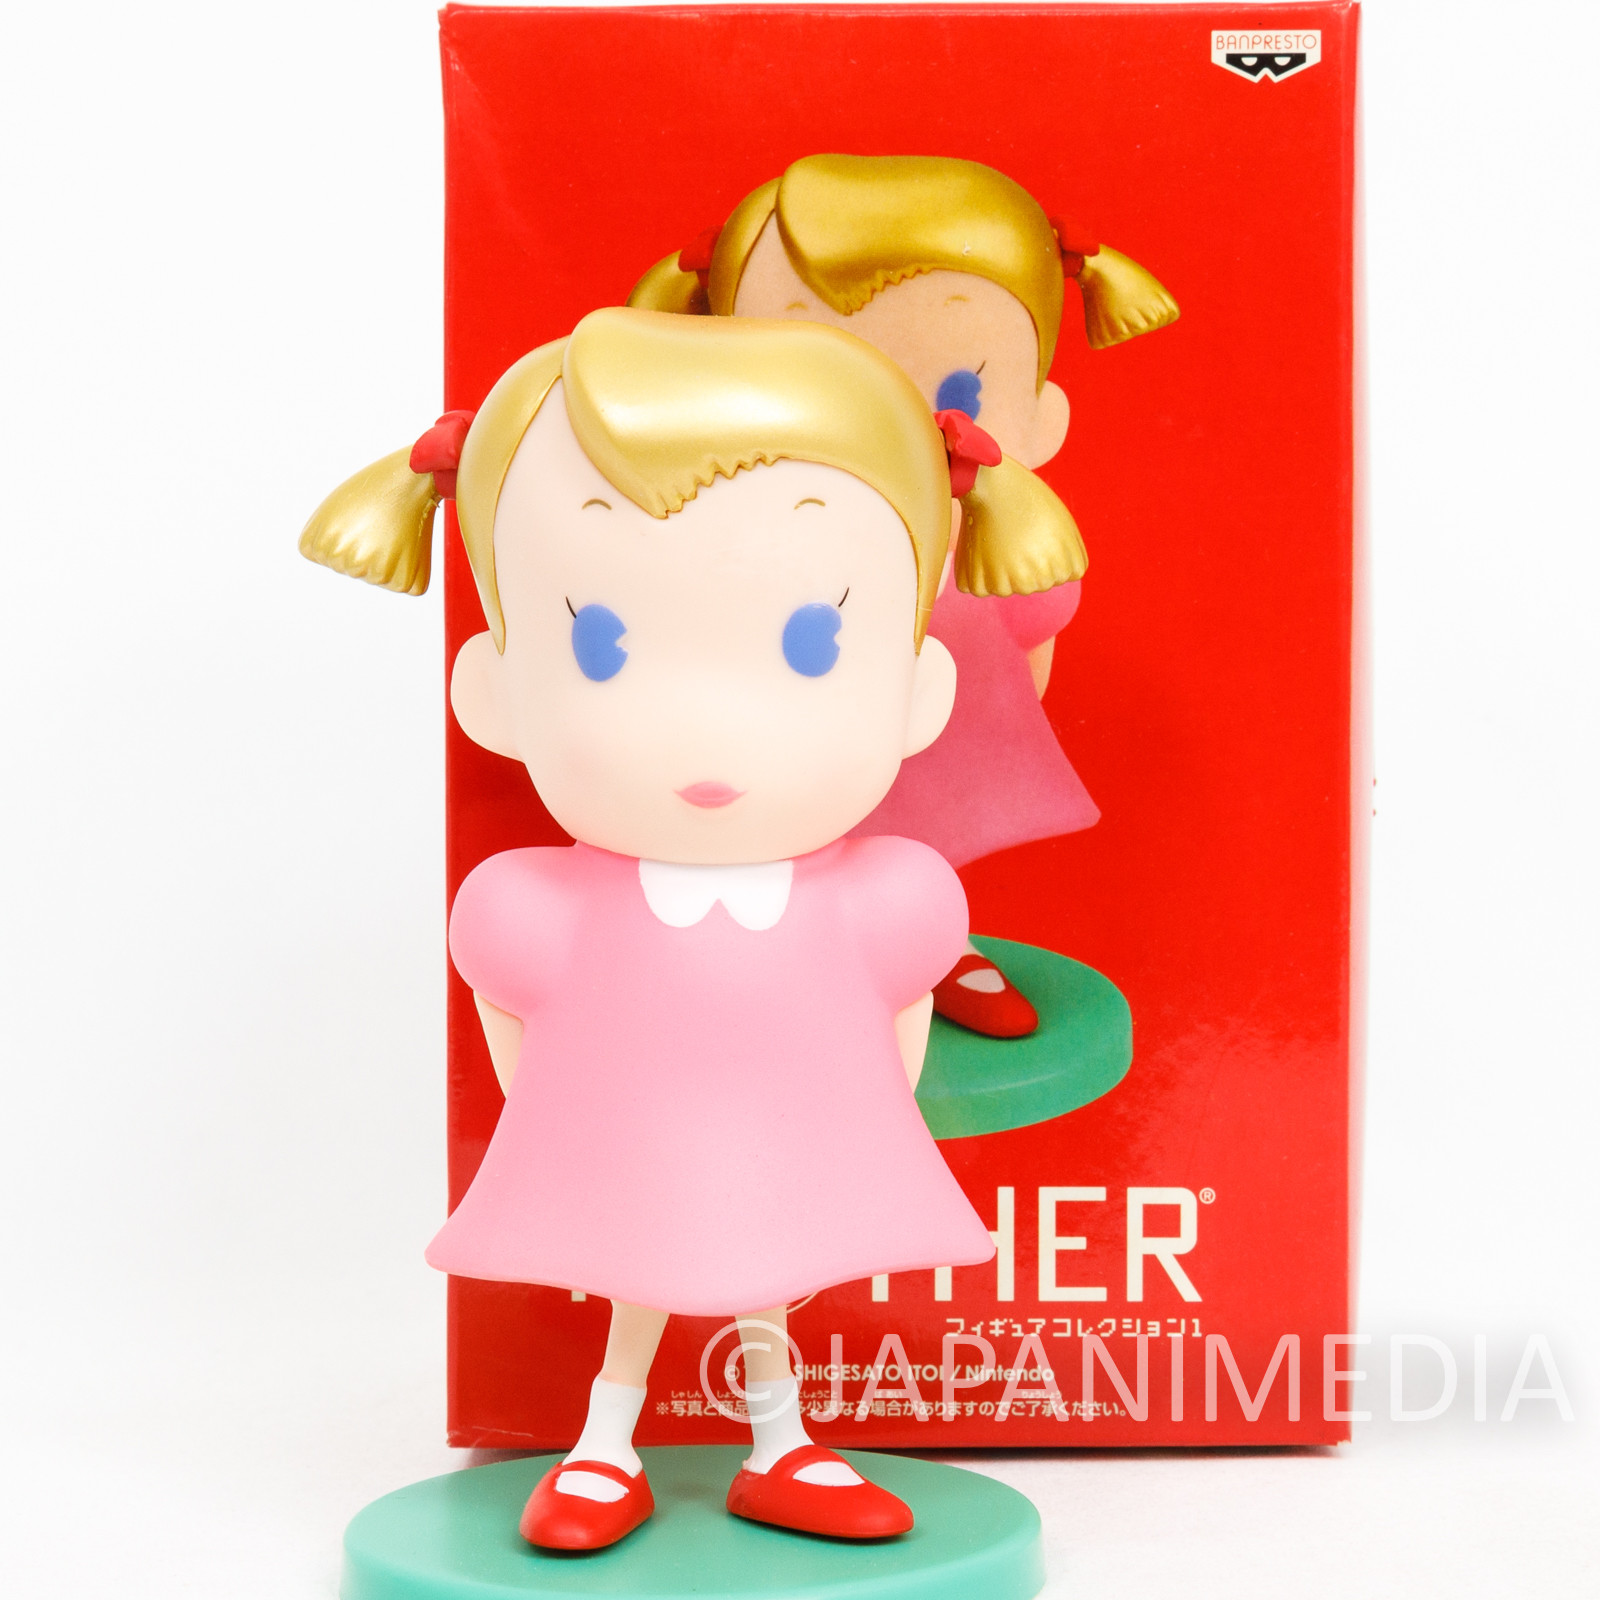 "MOTHER Anna Ana 5"" Figure Banpresto JAPAN NINTENDO FAMICOM NES GAME"